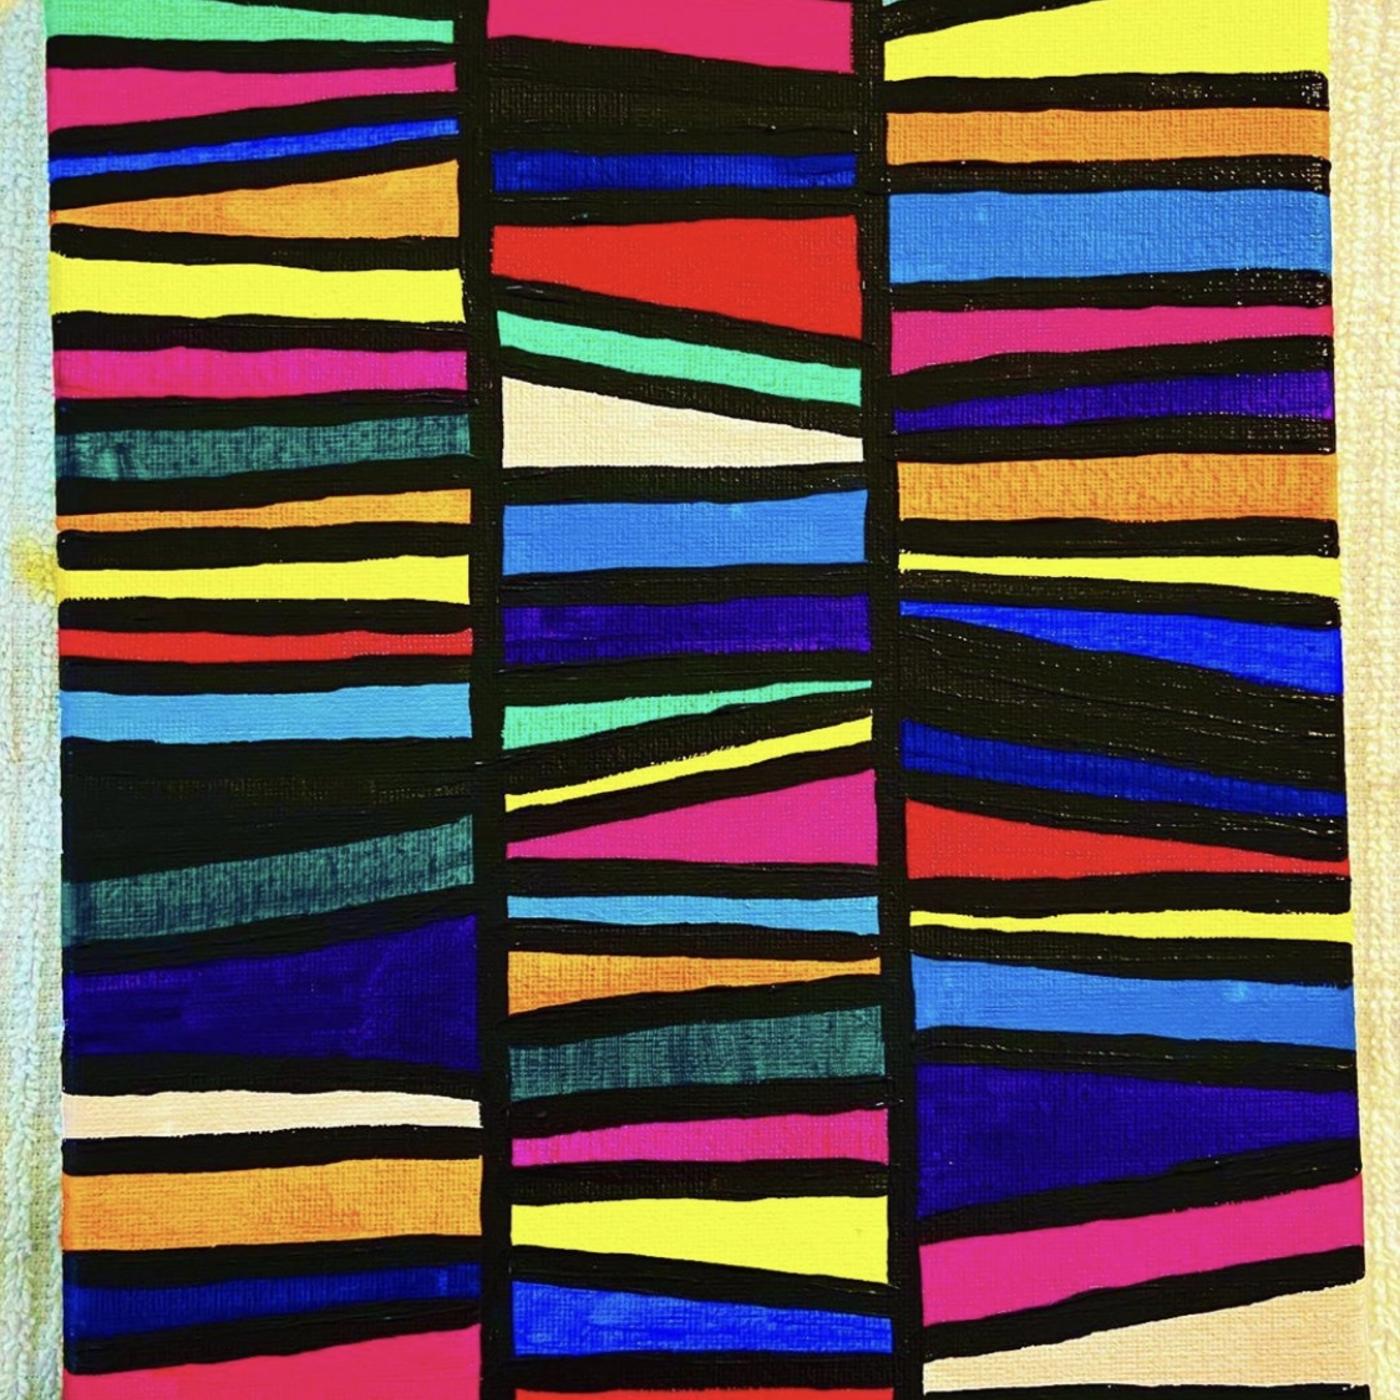 Coping With Trauma Through Art